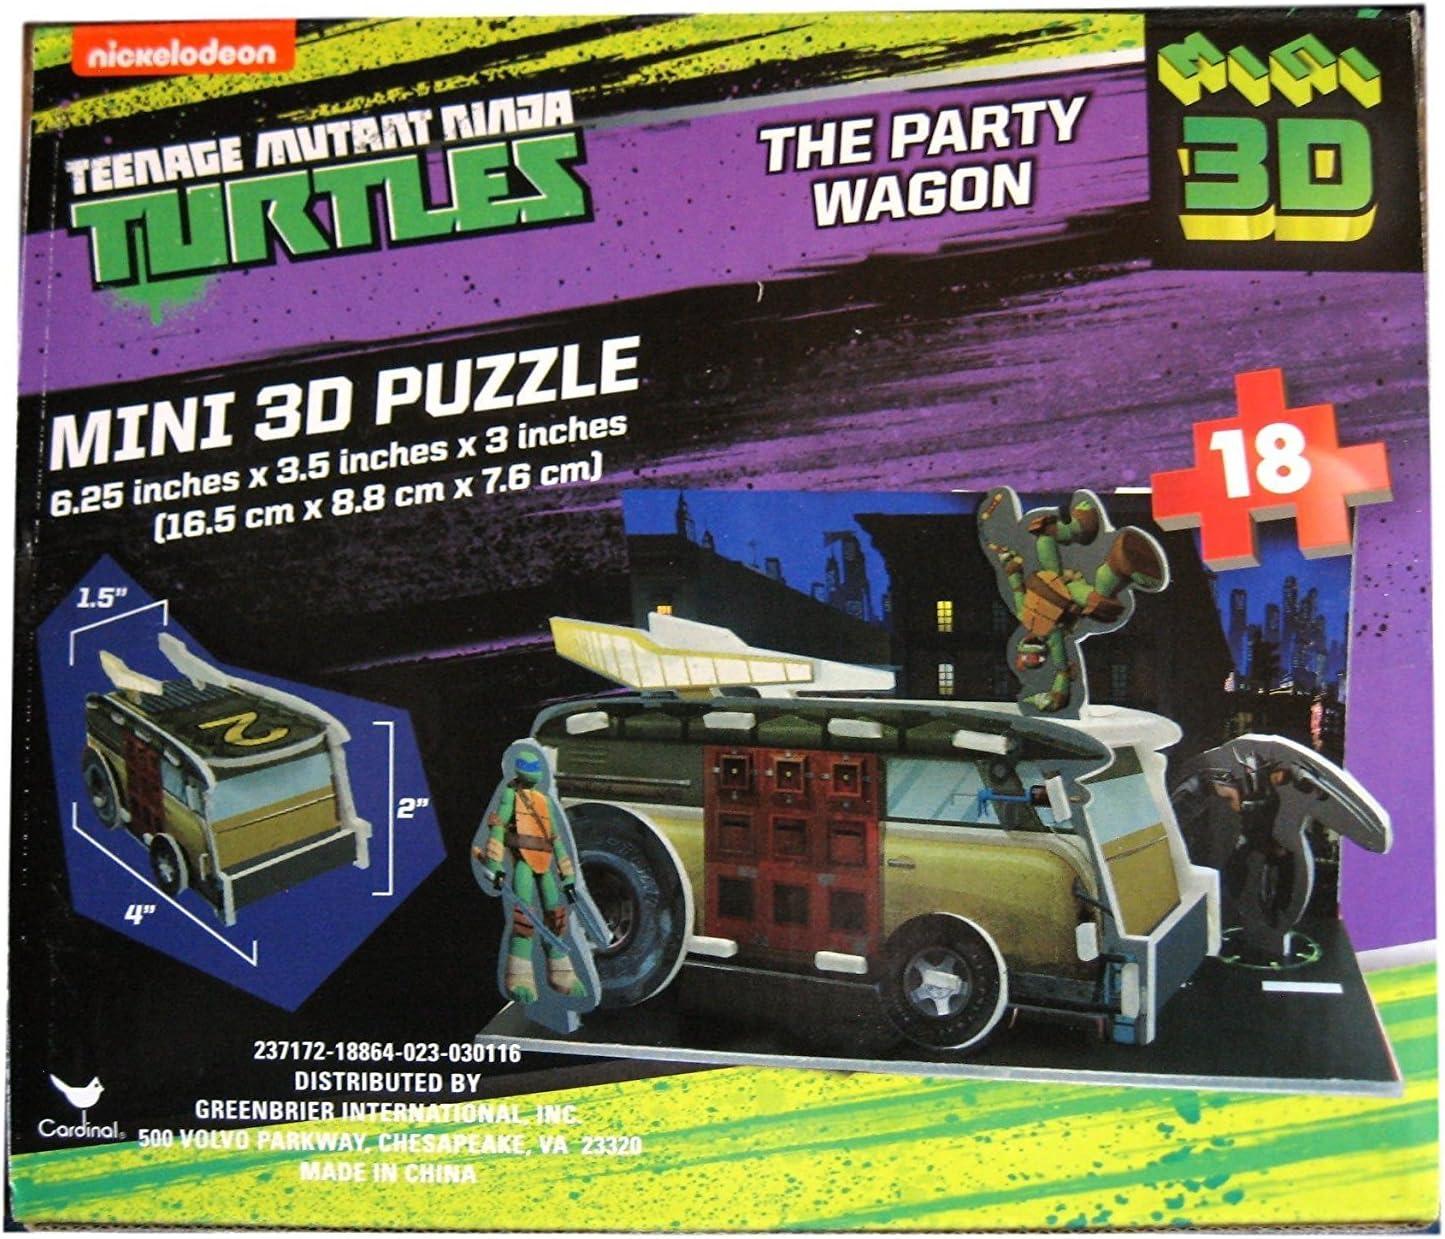 Kids Hot SELLER Party Summer Fun Teenage Mutant Ninja Turtles The Party Wagon Mini 3D Puzzle 18 Piece